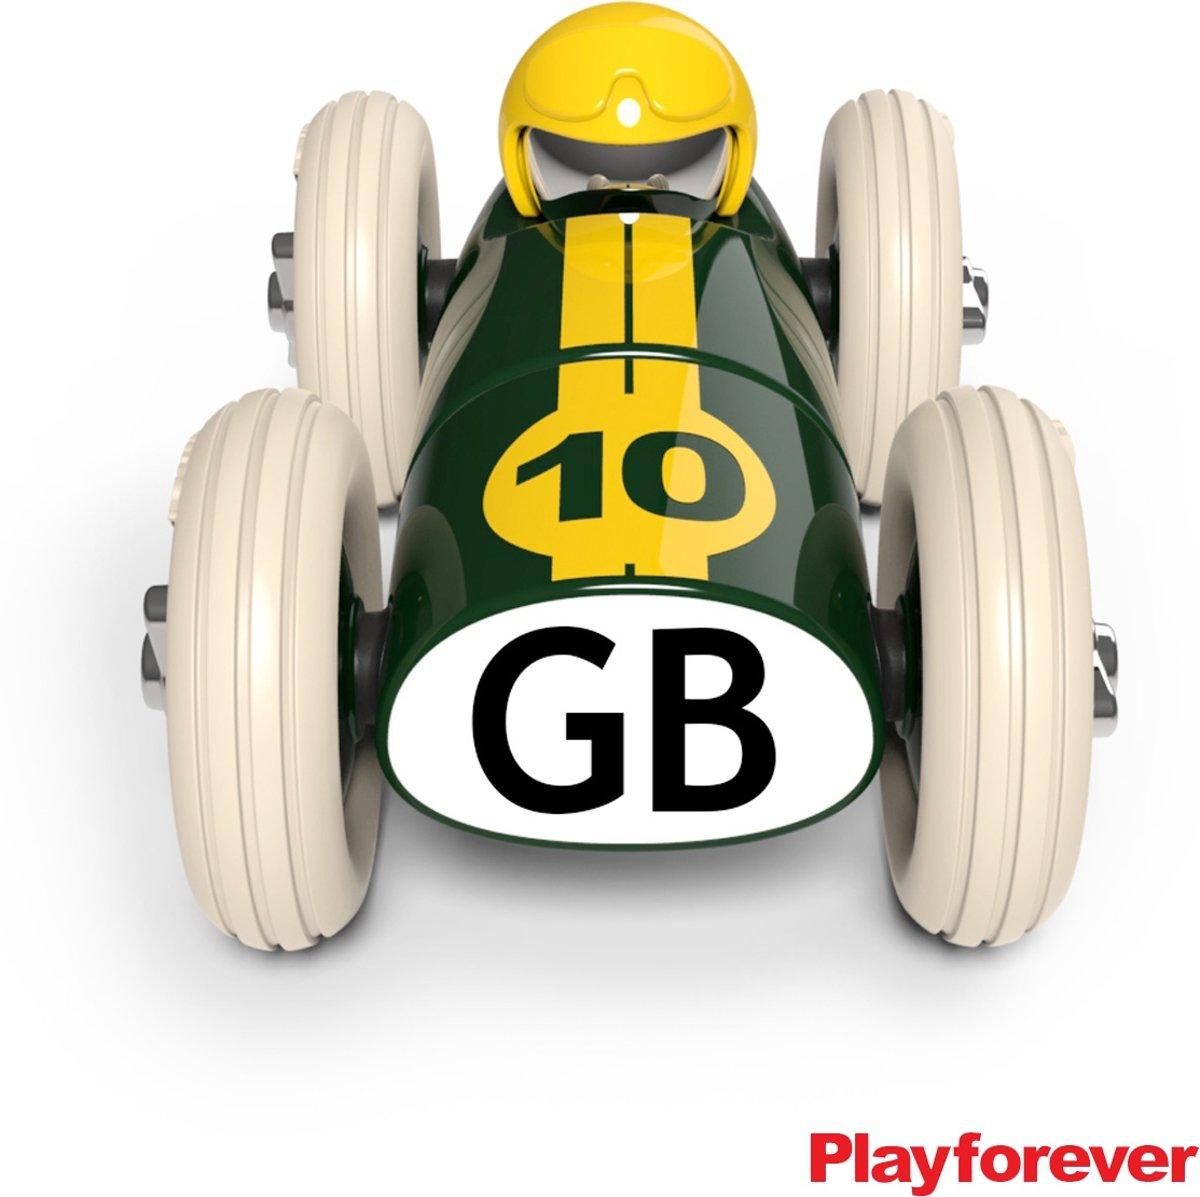 Playforever - Bonnie GB